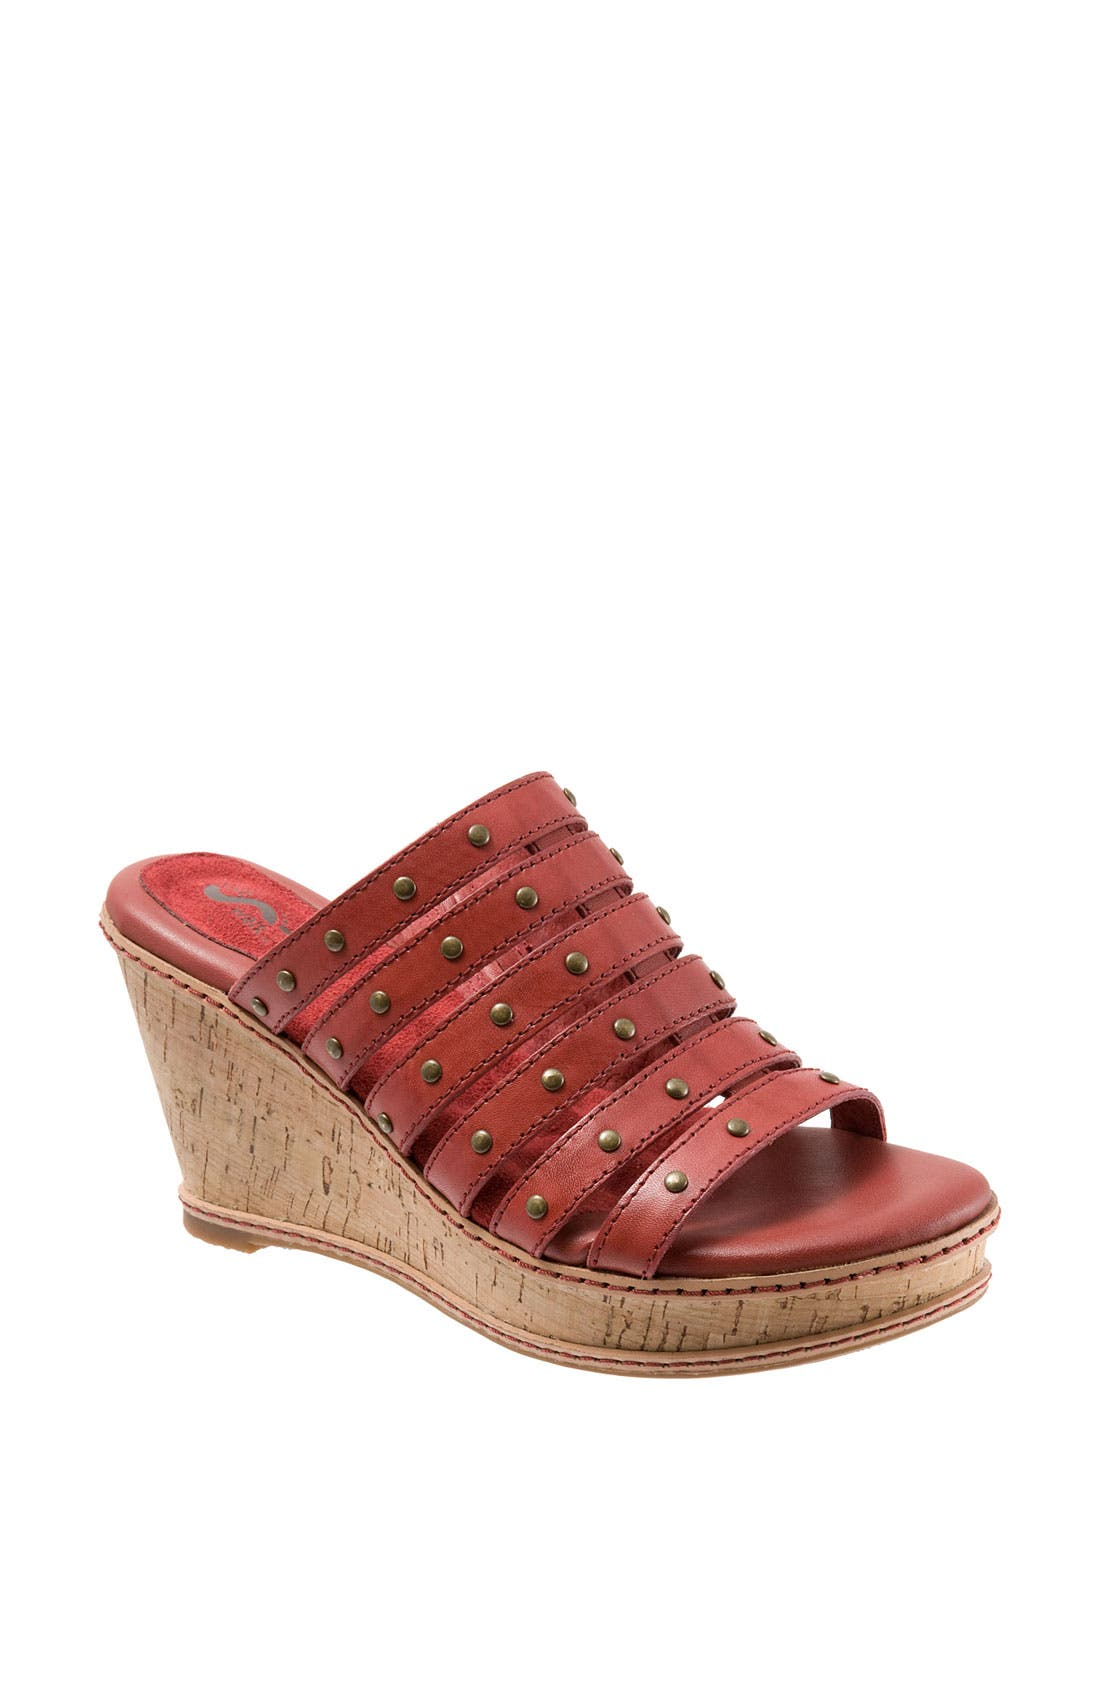 Main Image - SoftWalk® 'San Fran' Wedge Sandal